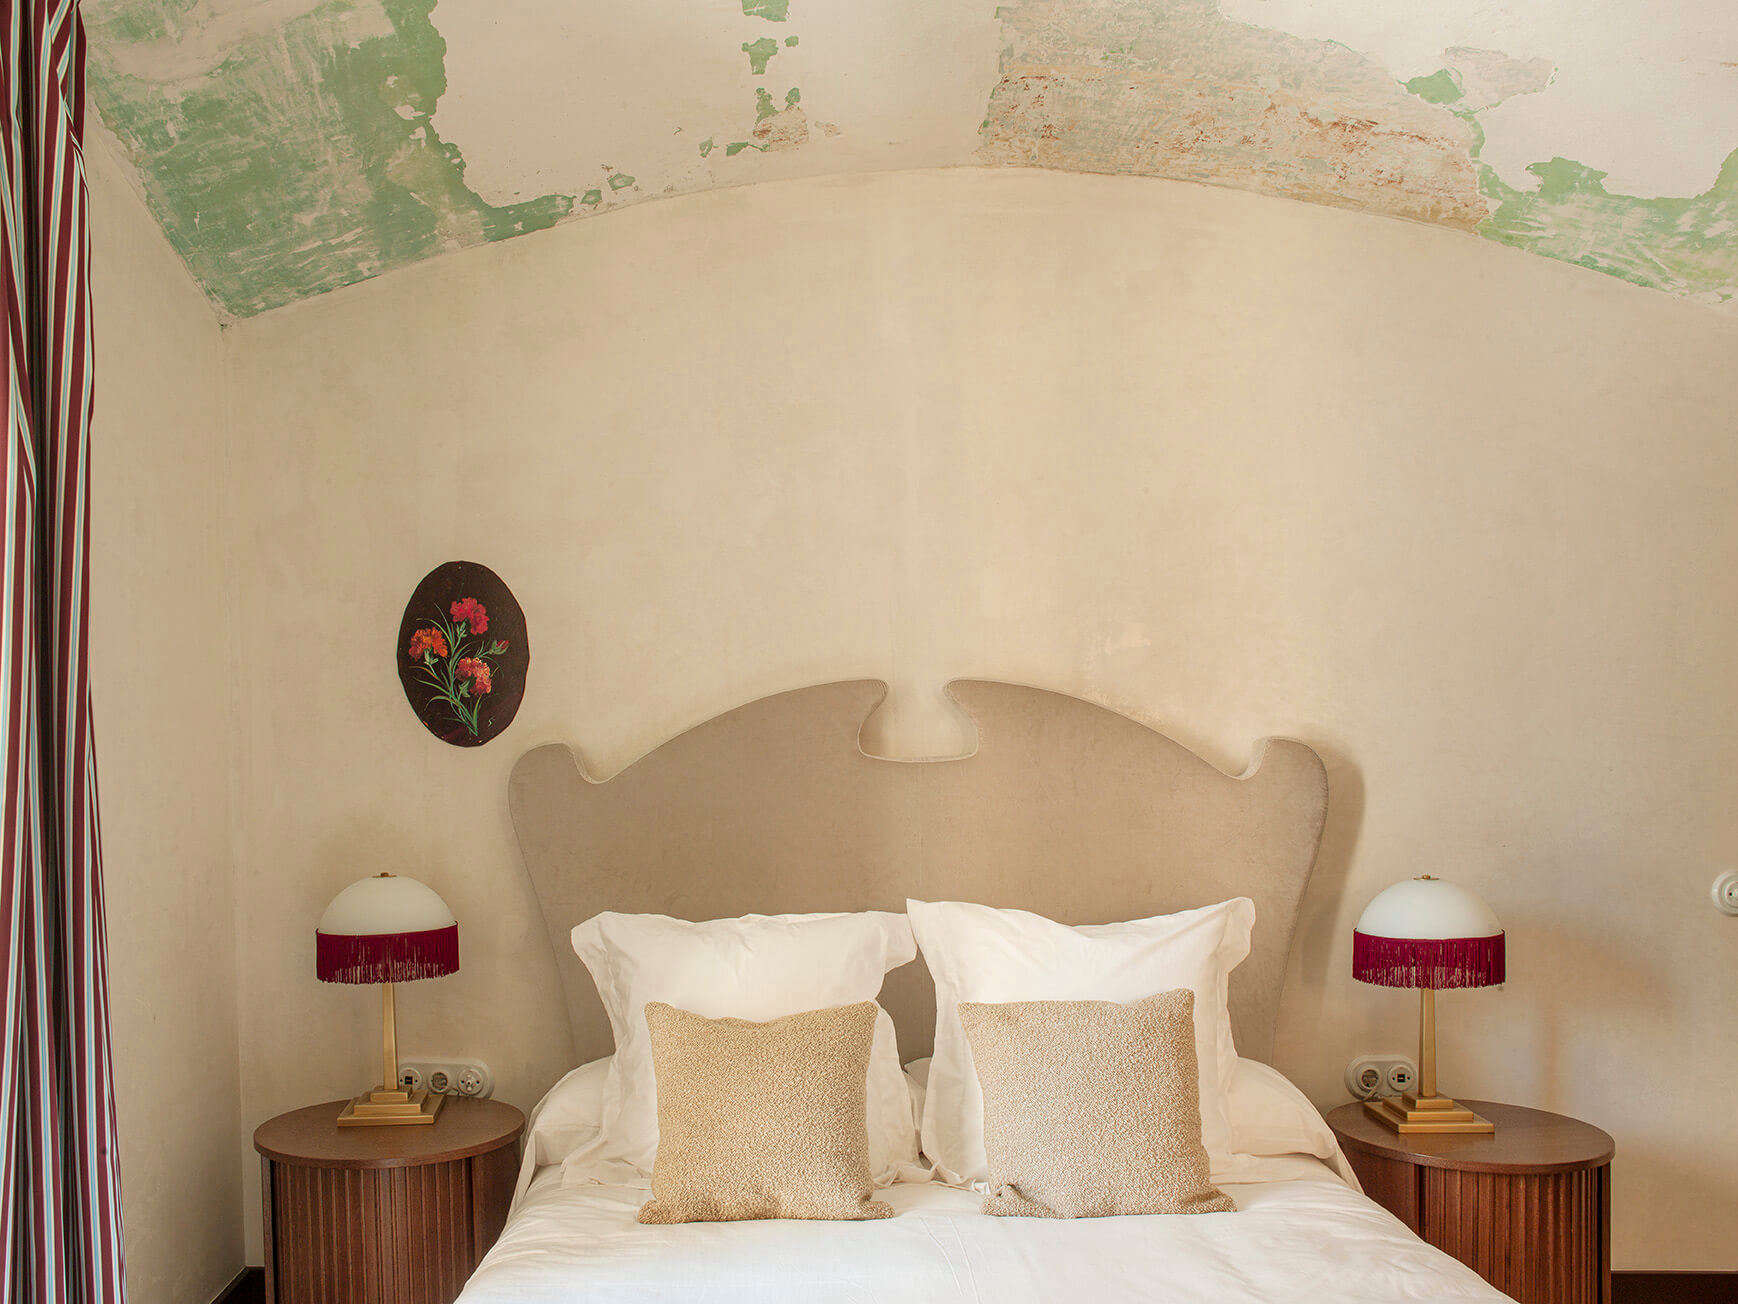 La Bionda Hotel in Begur, Spain on the Costa Brava: A Stylish, Eco Hotel Designed by Quintana Partners